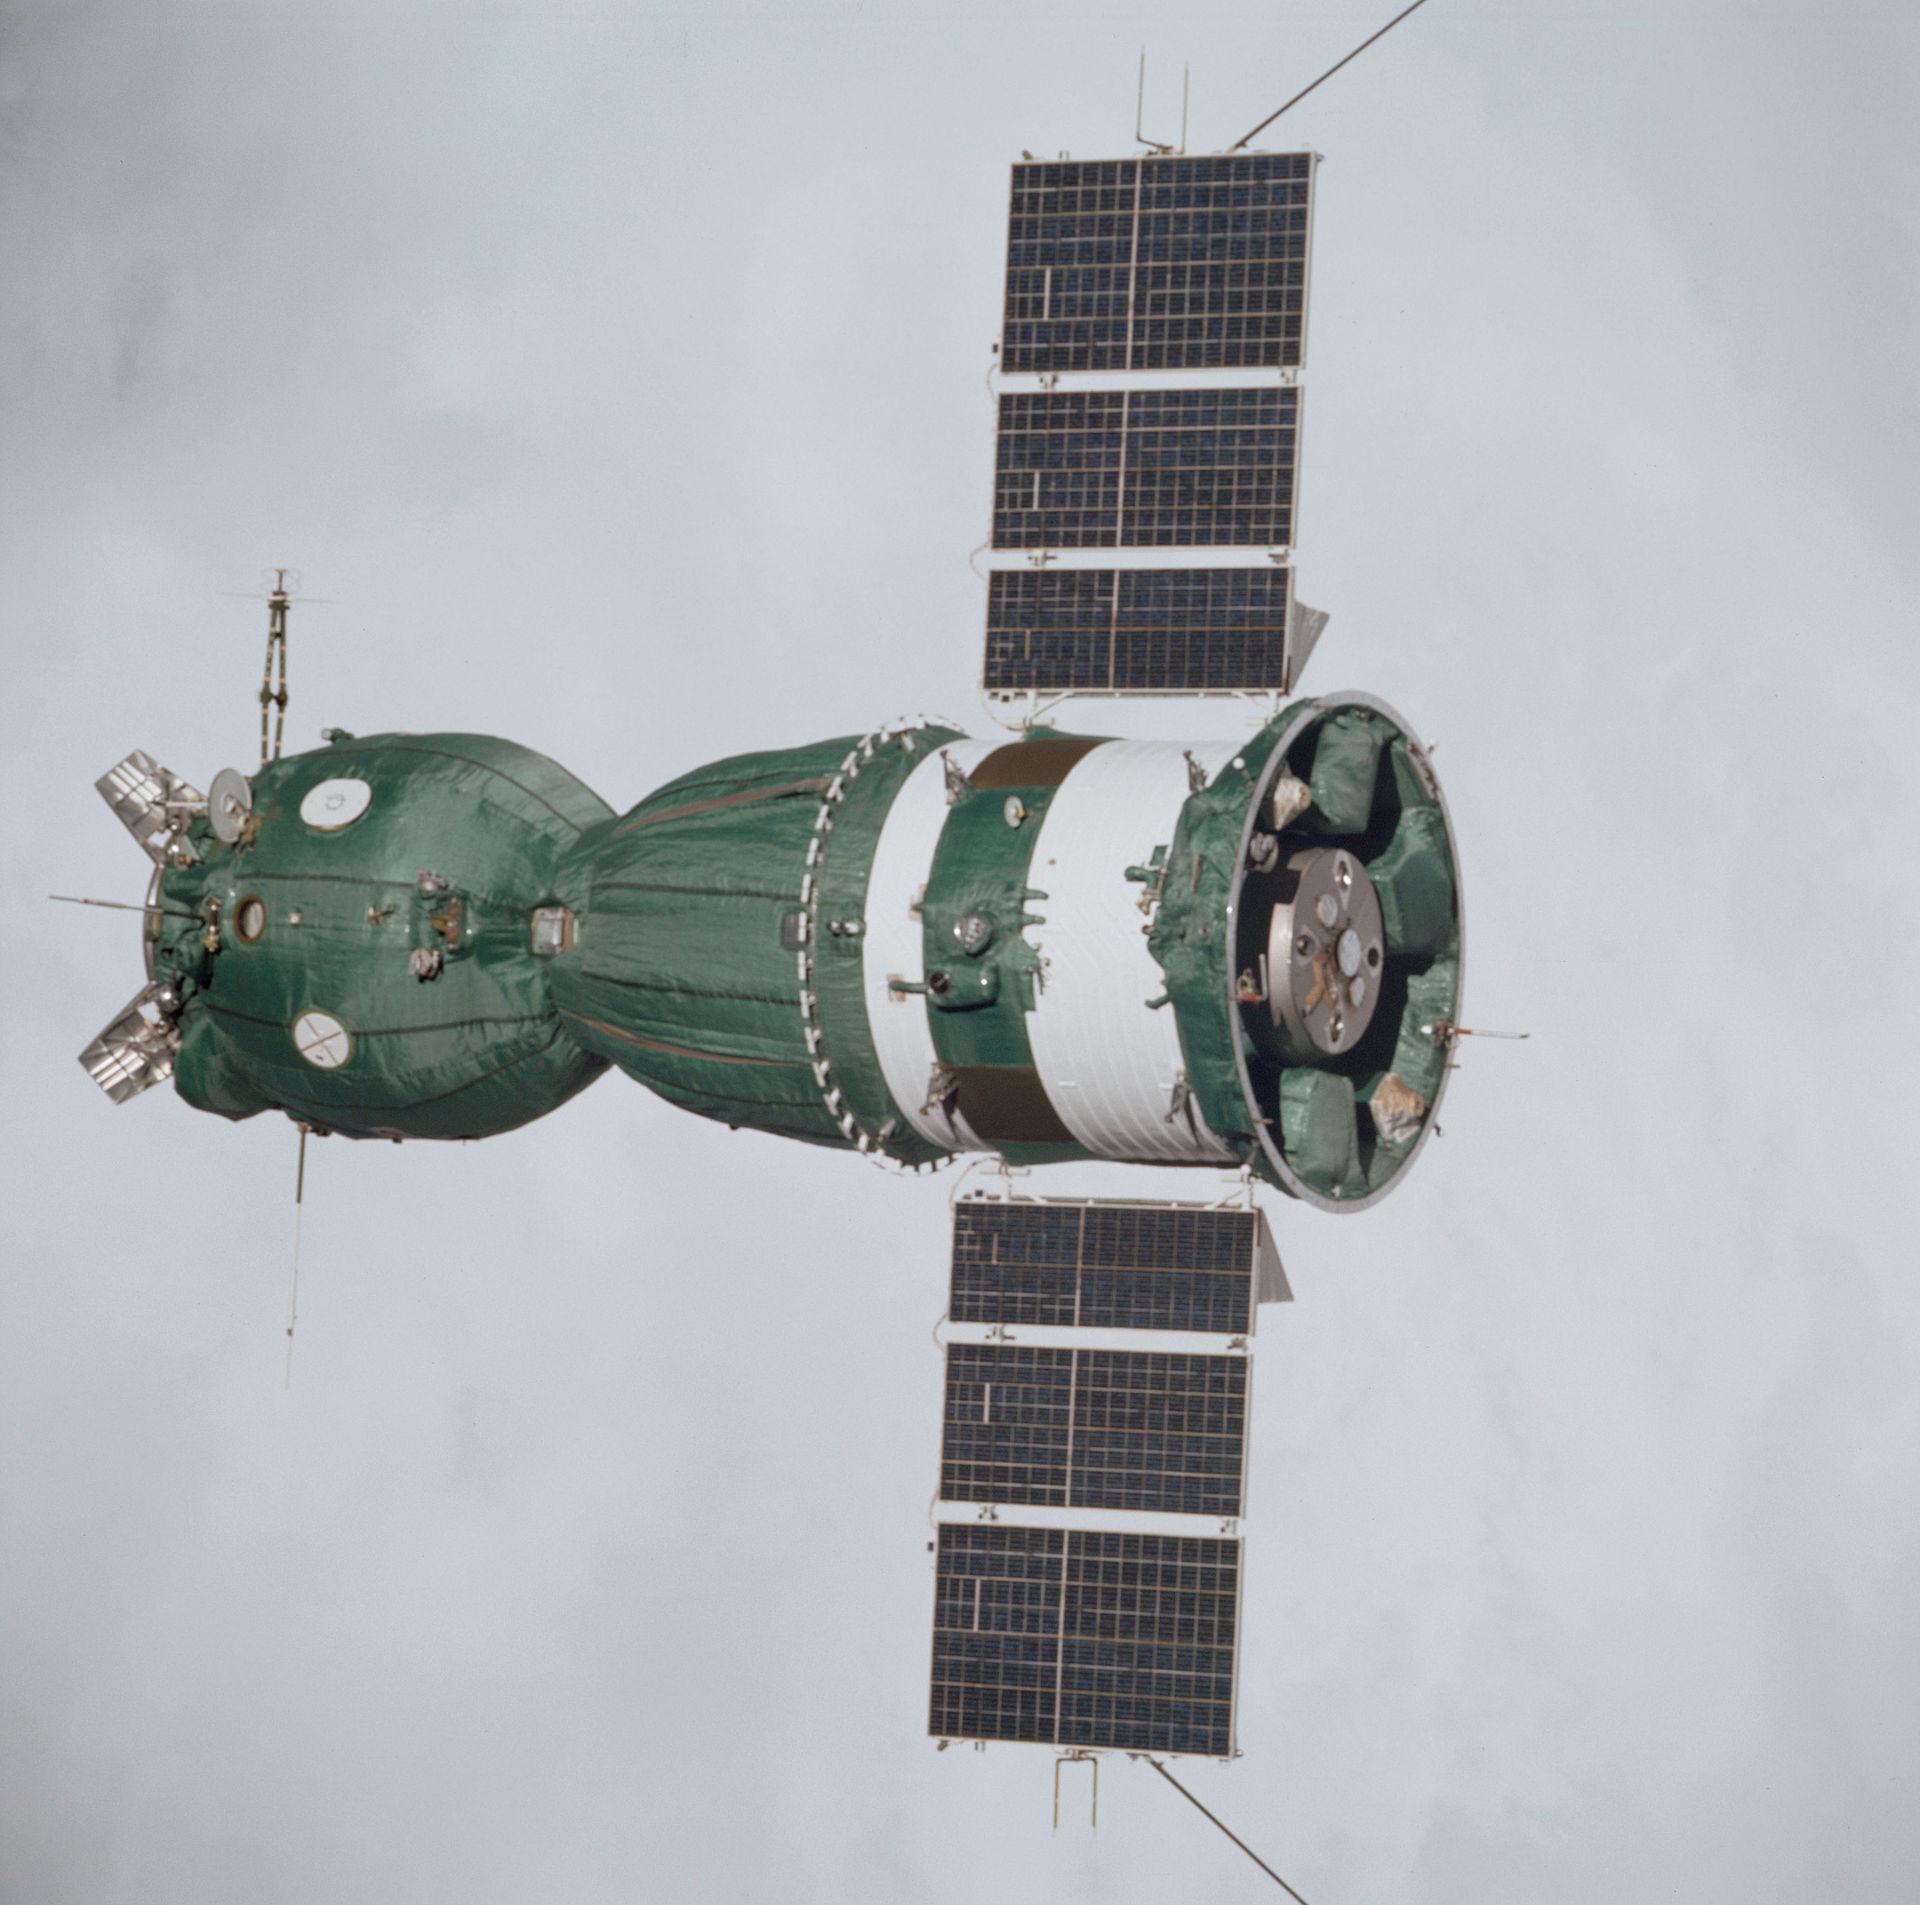 The only unmodified Soyuz 7K-TM to fly in space ( spaceflight.nasa.gov )